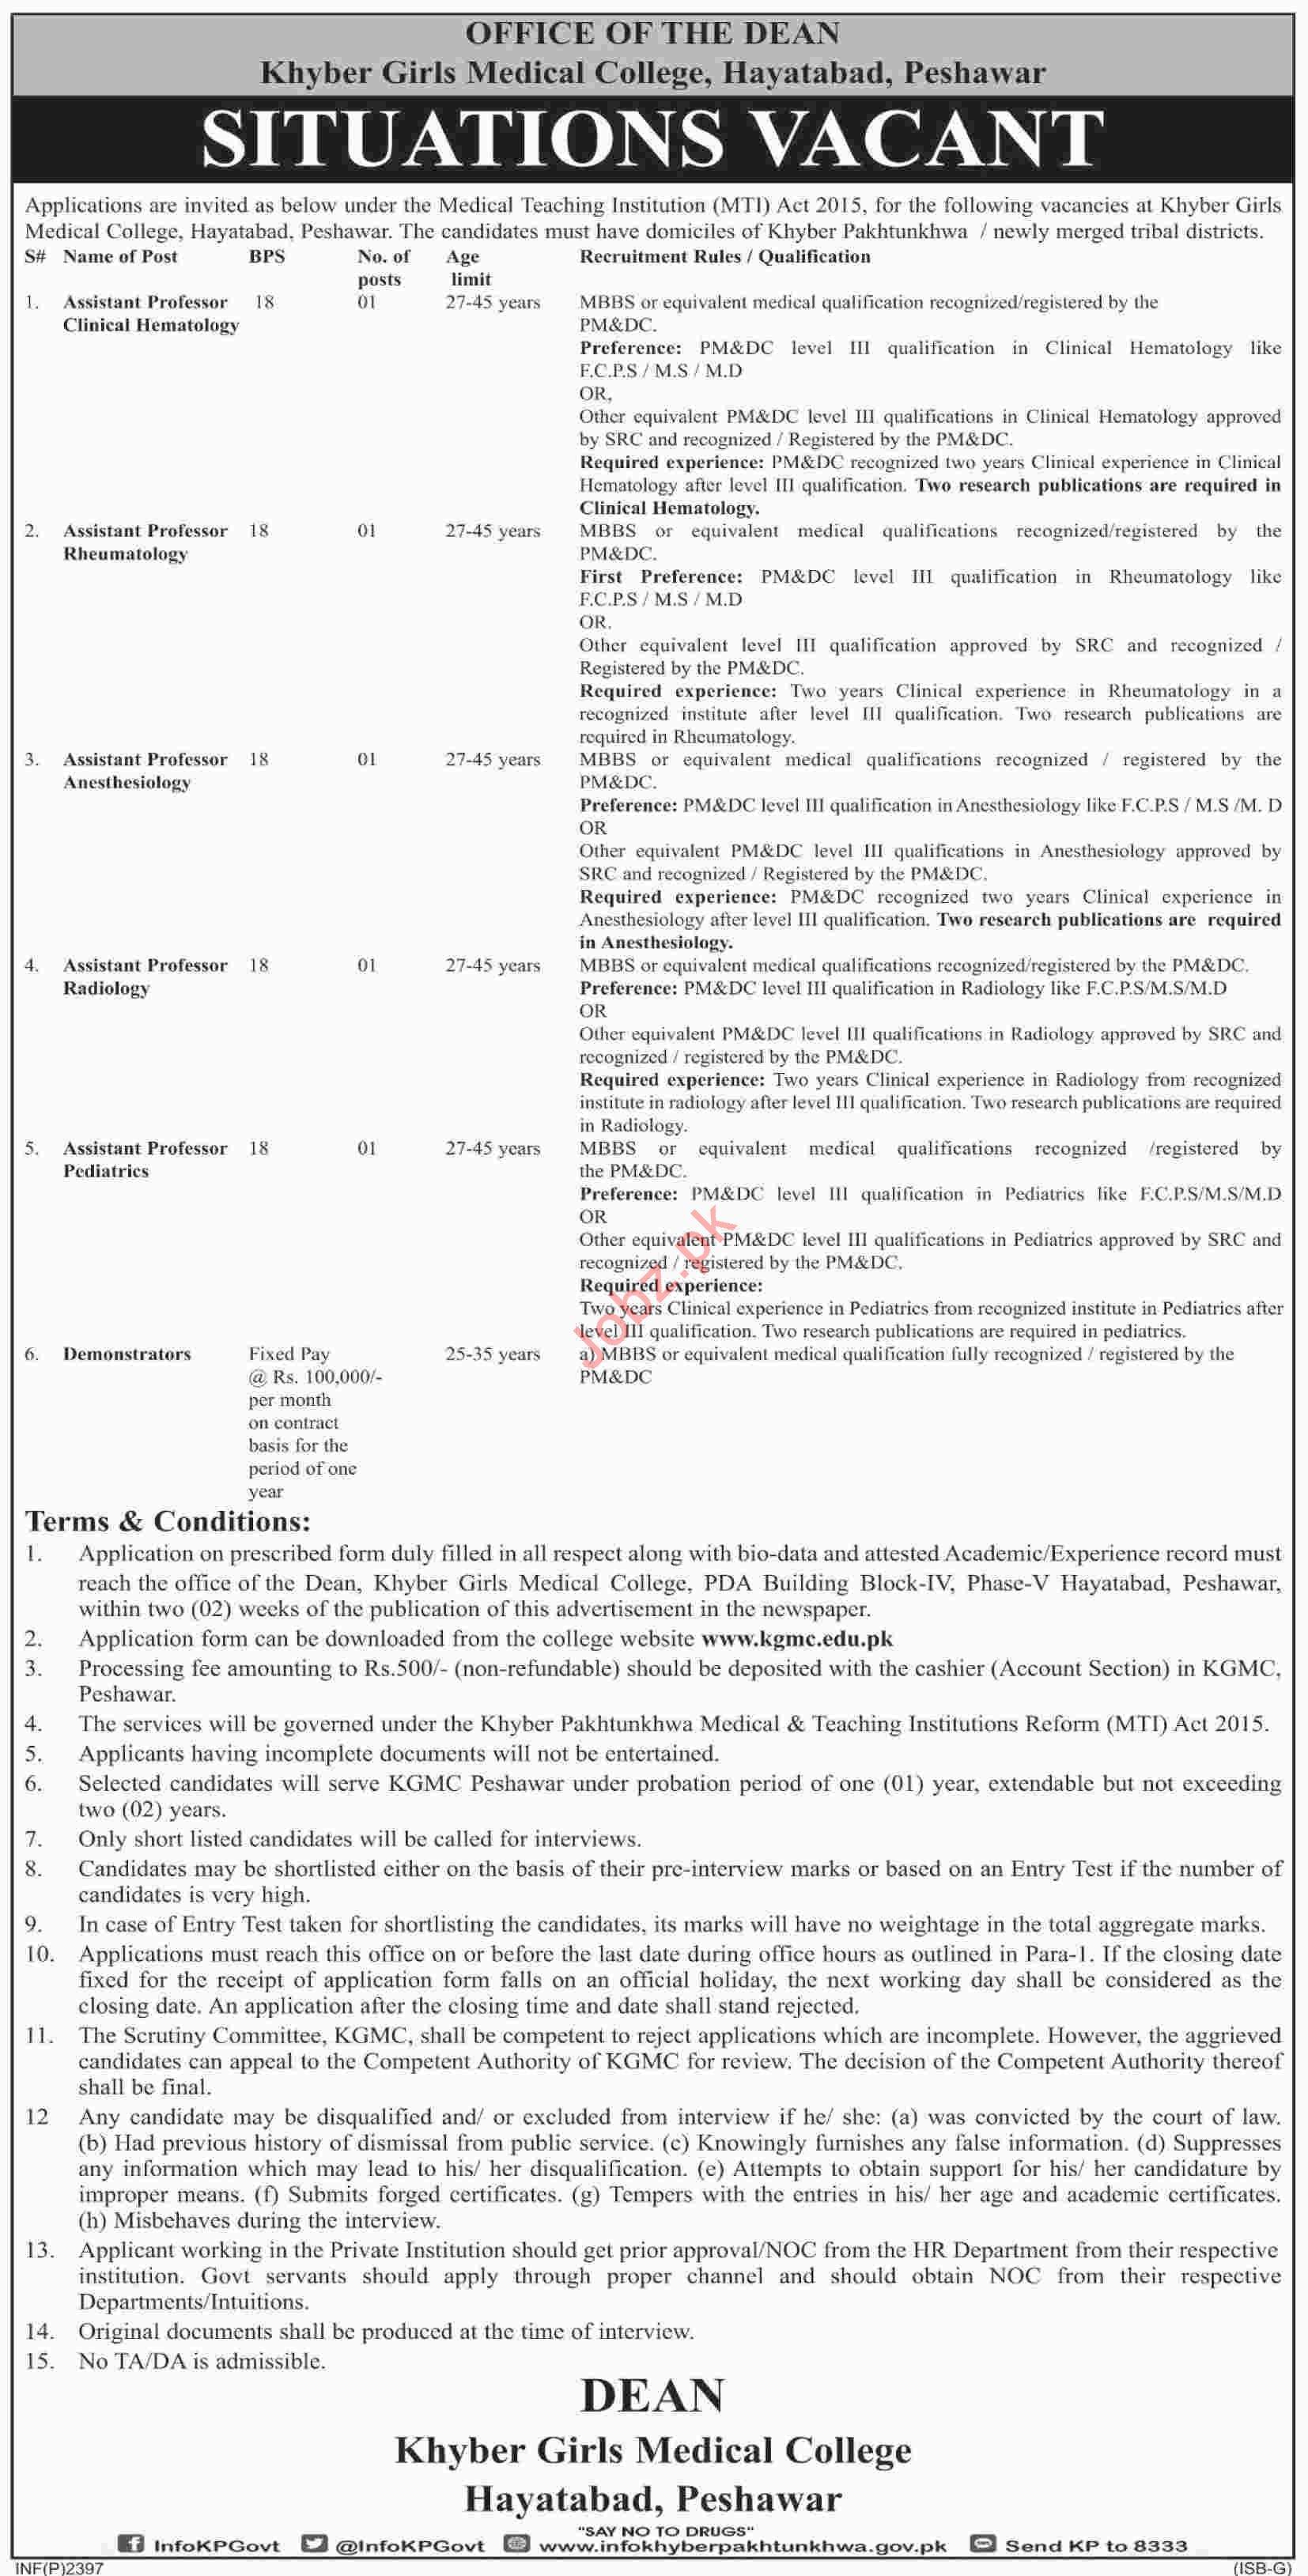 Khyber Girls Medical College KGMC Peshawar Jobs 2019